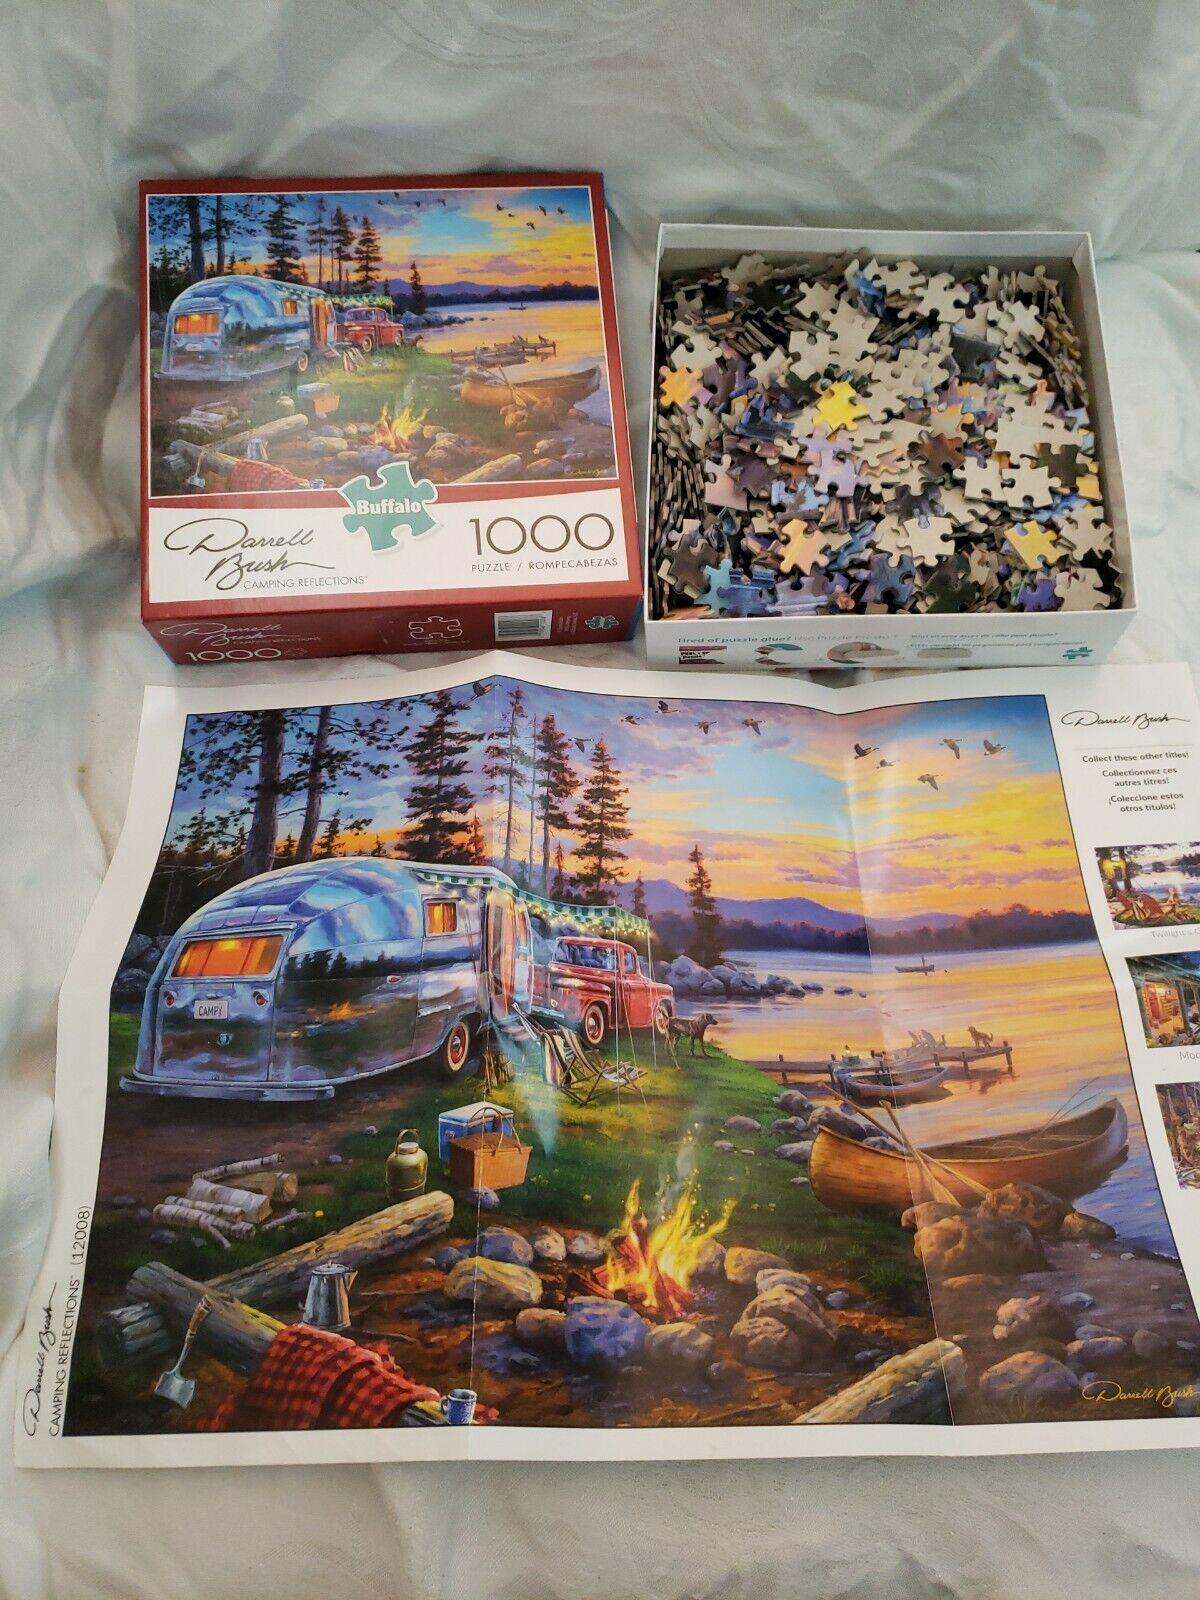 Darrell Bush 1000 Piece Jigsaw Puzzle Camping Reflections Buffalo Games